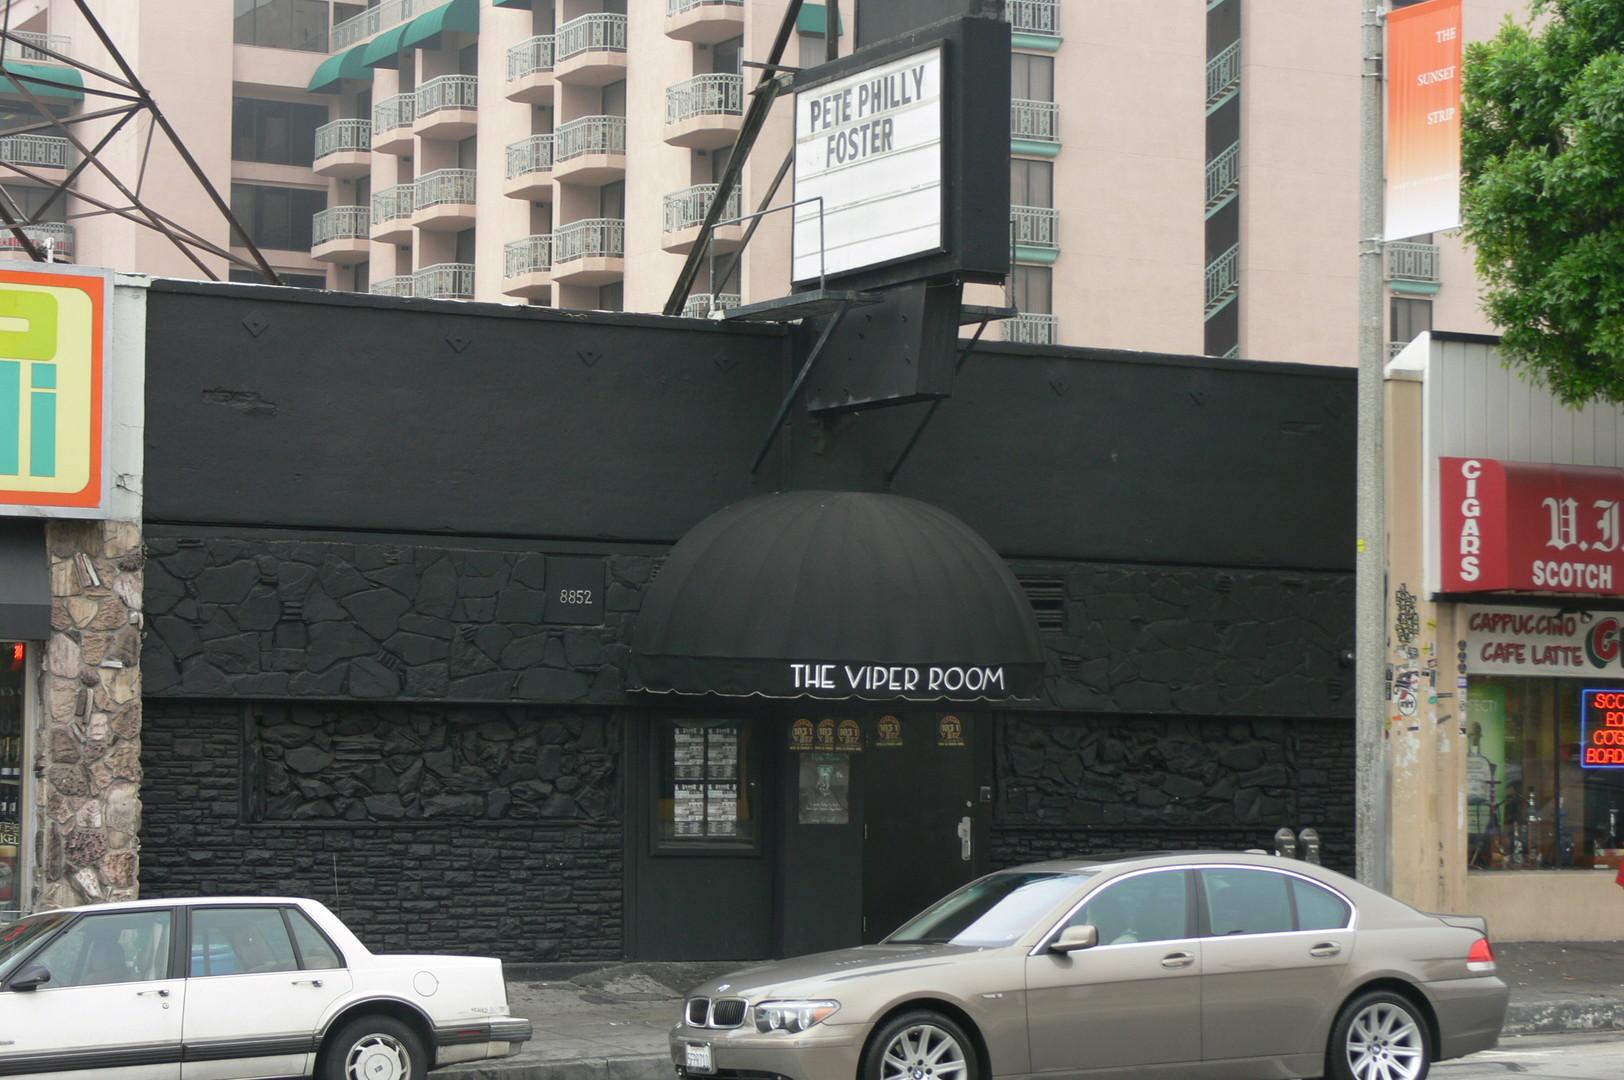 Viper Room: όσα δεν ξέρετε για το «δηλητηριώδες»  κλαμπ του Χόλιγουντ! Ο μύθος και η κατάρα